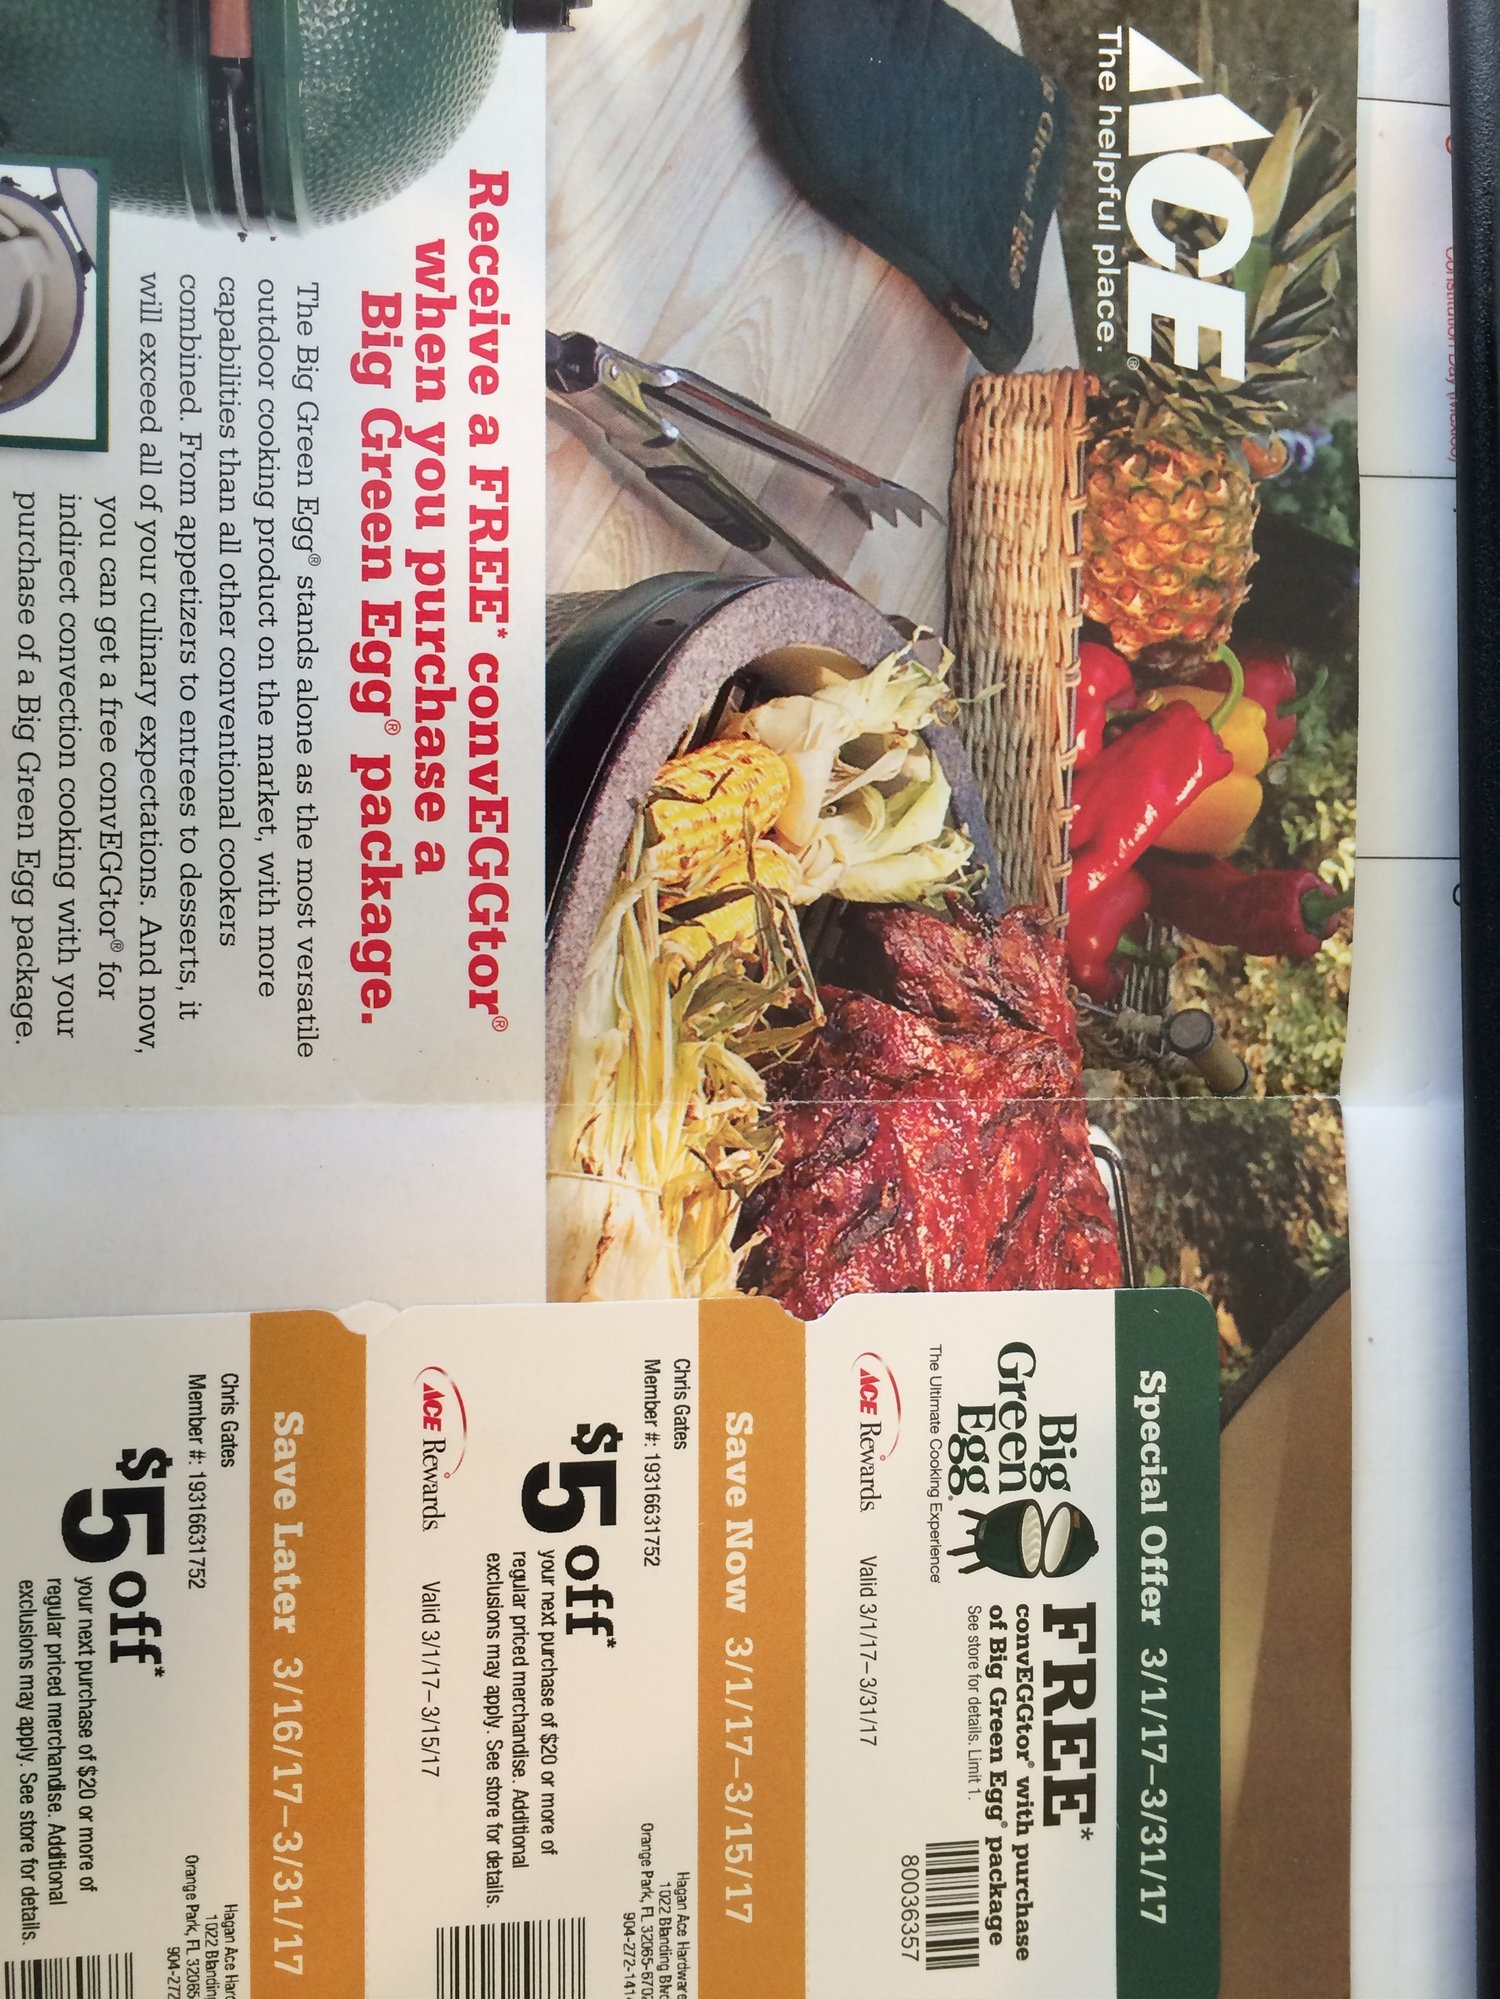 Big green egg discount coupons